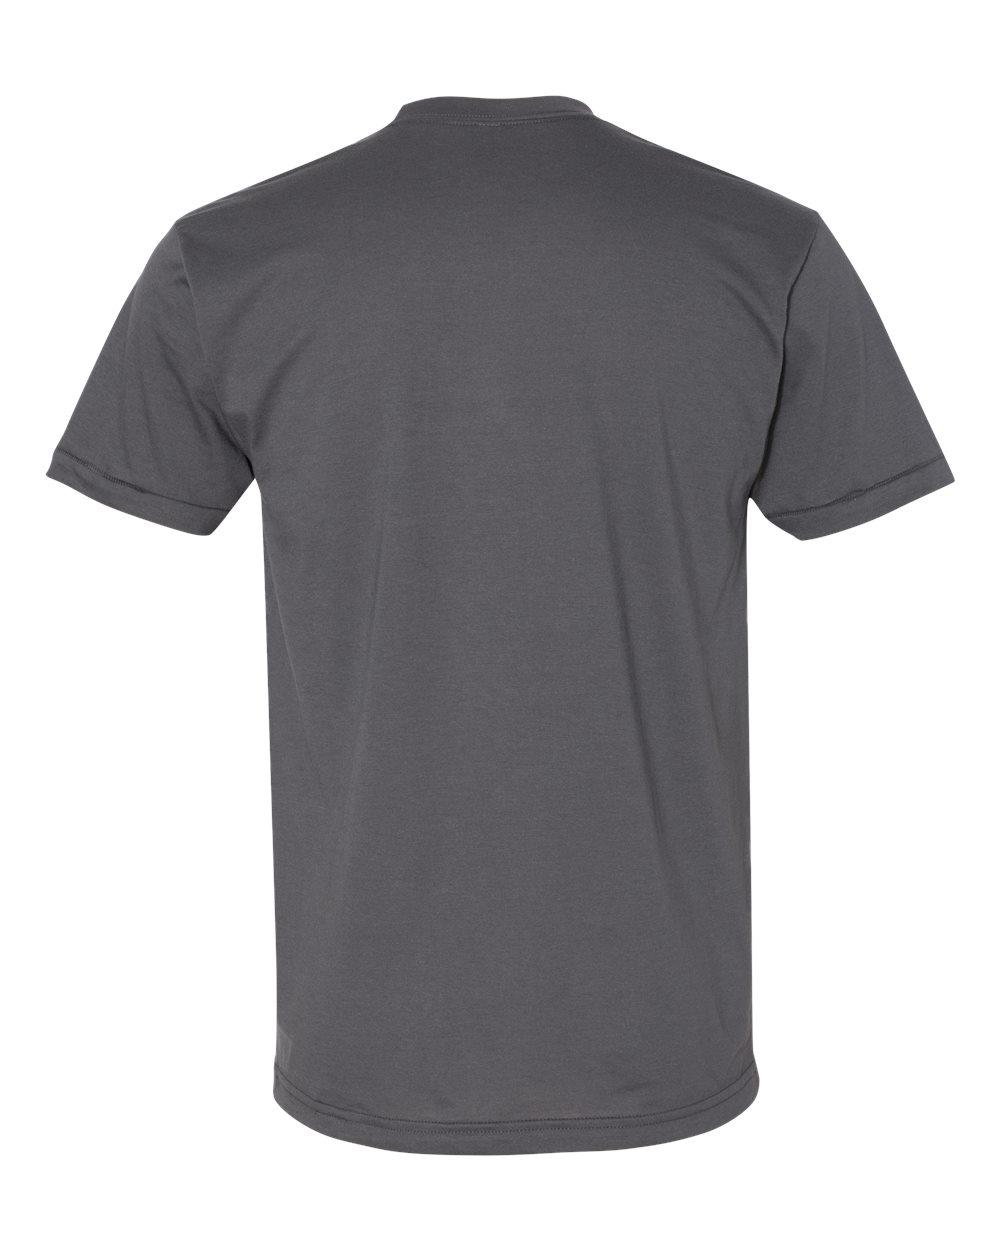 American-Apparel-Mens-Slim-Fit-50-50-Cotton-T-Shirt-Tee-BB401W-up-to-2XL thumbnail 7